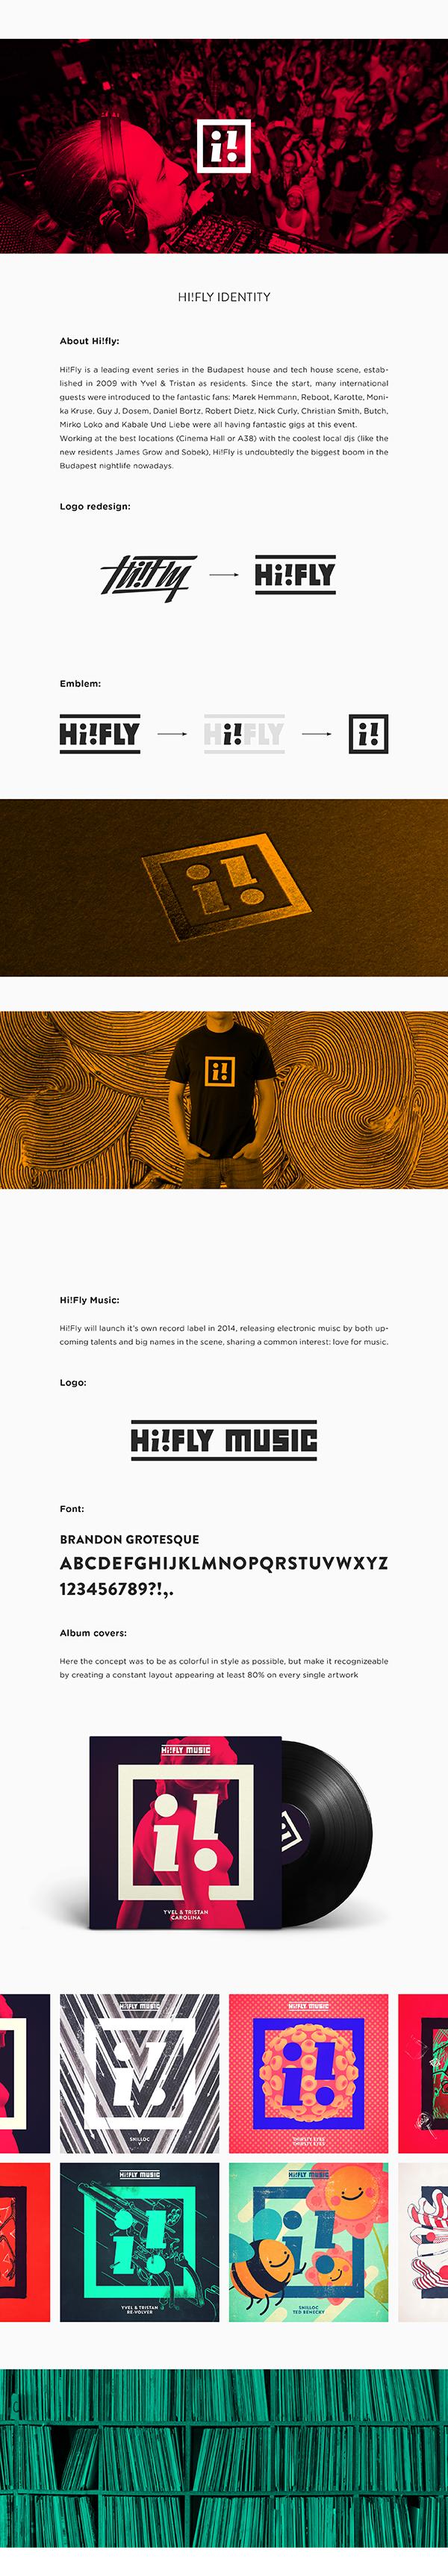 dj flyer album cover logo Logo Design album art electronic techno rebranding party series record label vinyl hungary minimal type